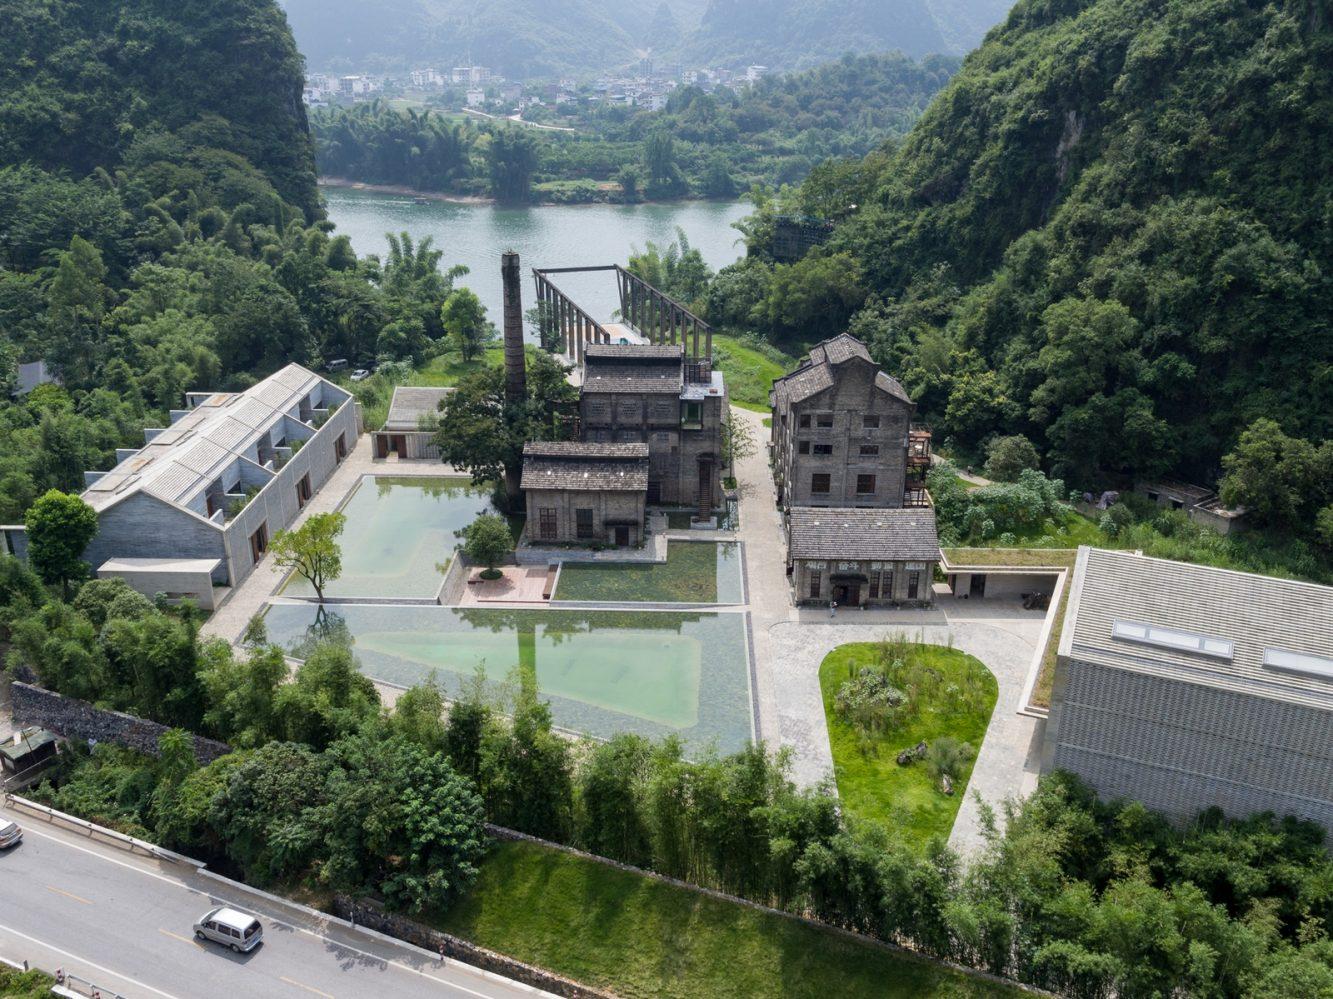 Hotel Alila en Yangshuo, China. Obra de Vector Architects.